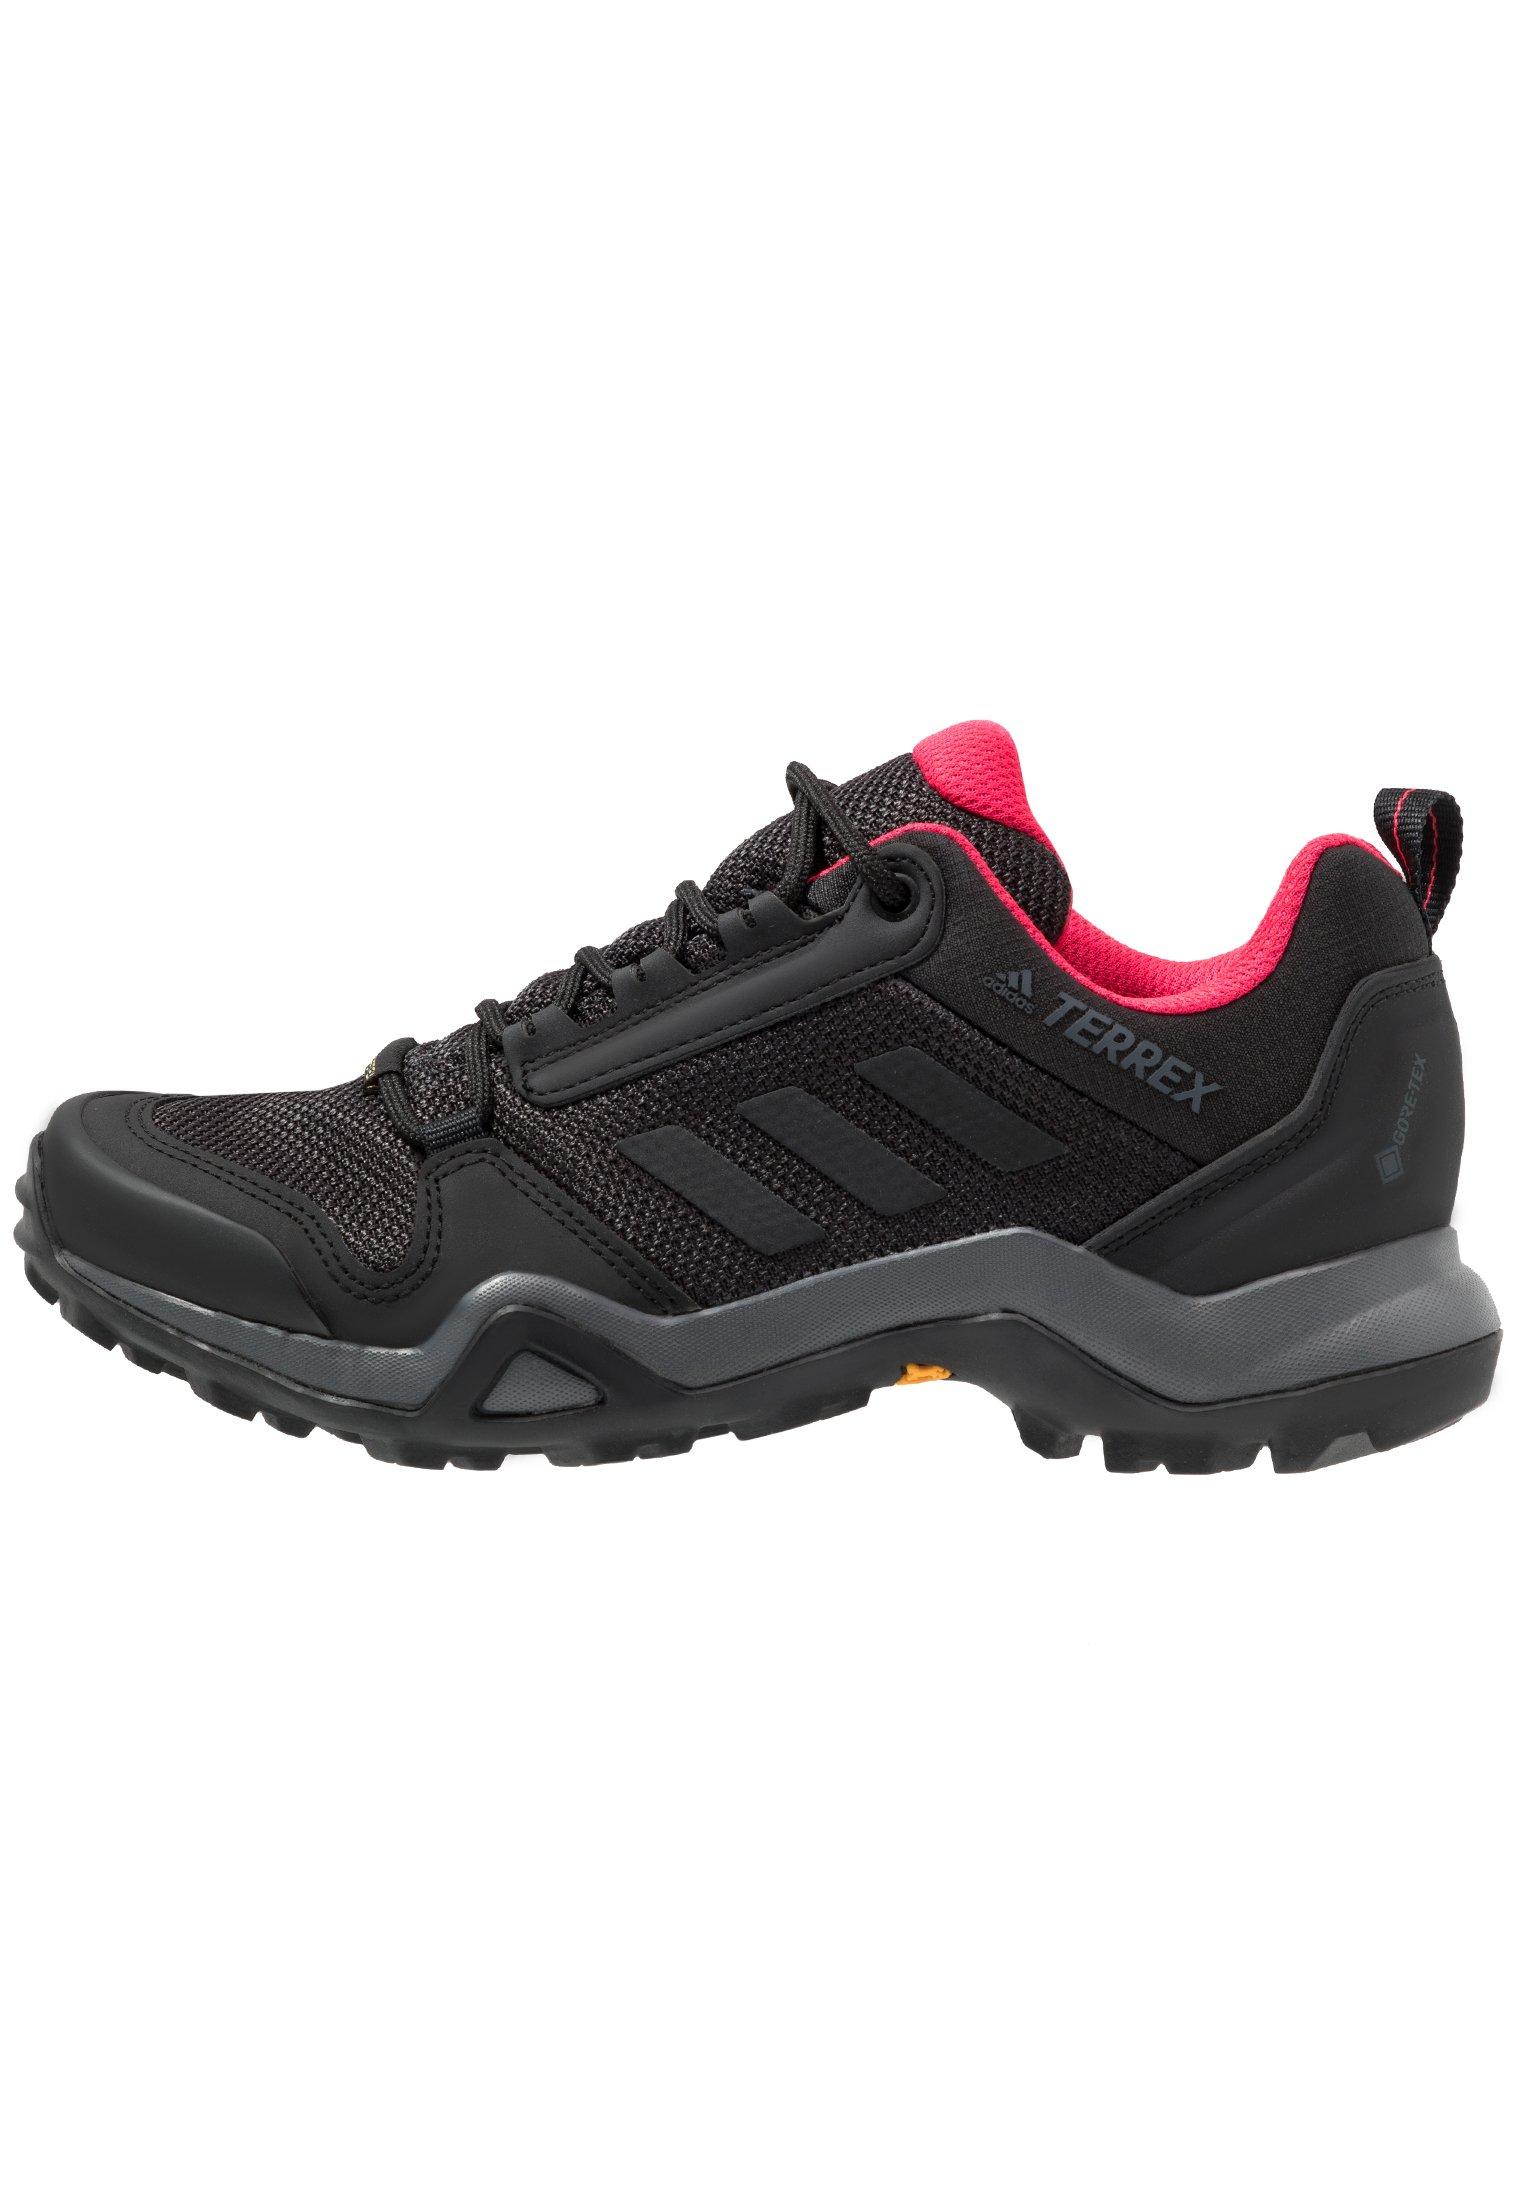 Adidas Mens Terrex AX3 Chaussures de marche-GRIS Sports Extérieur Respirant